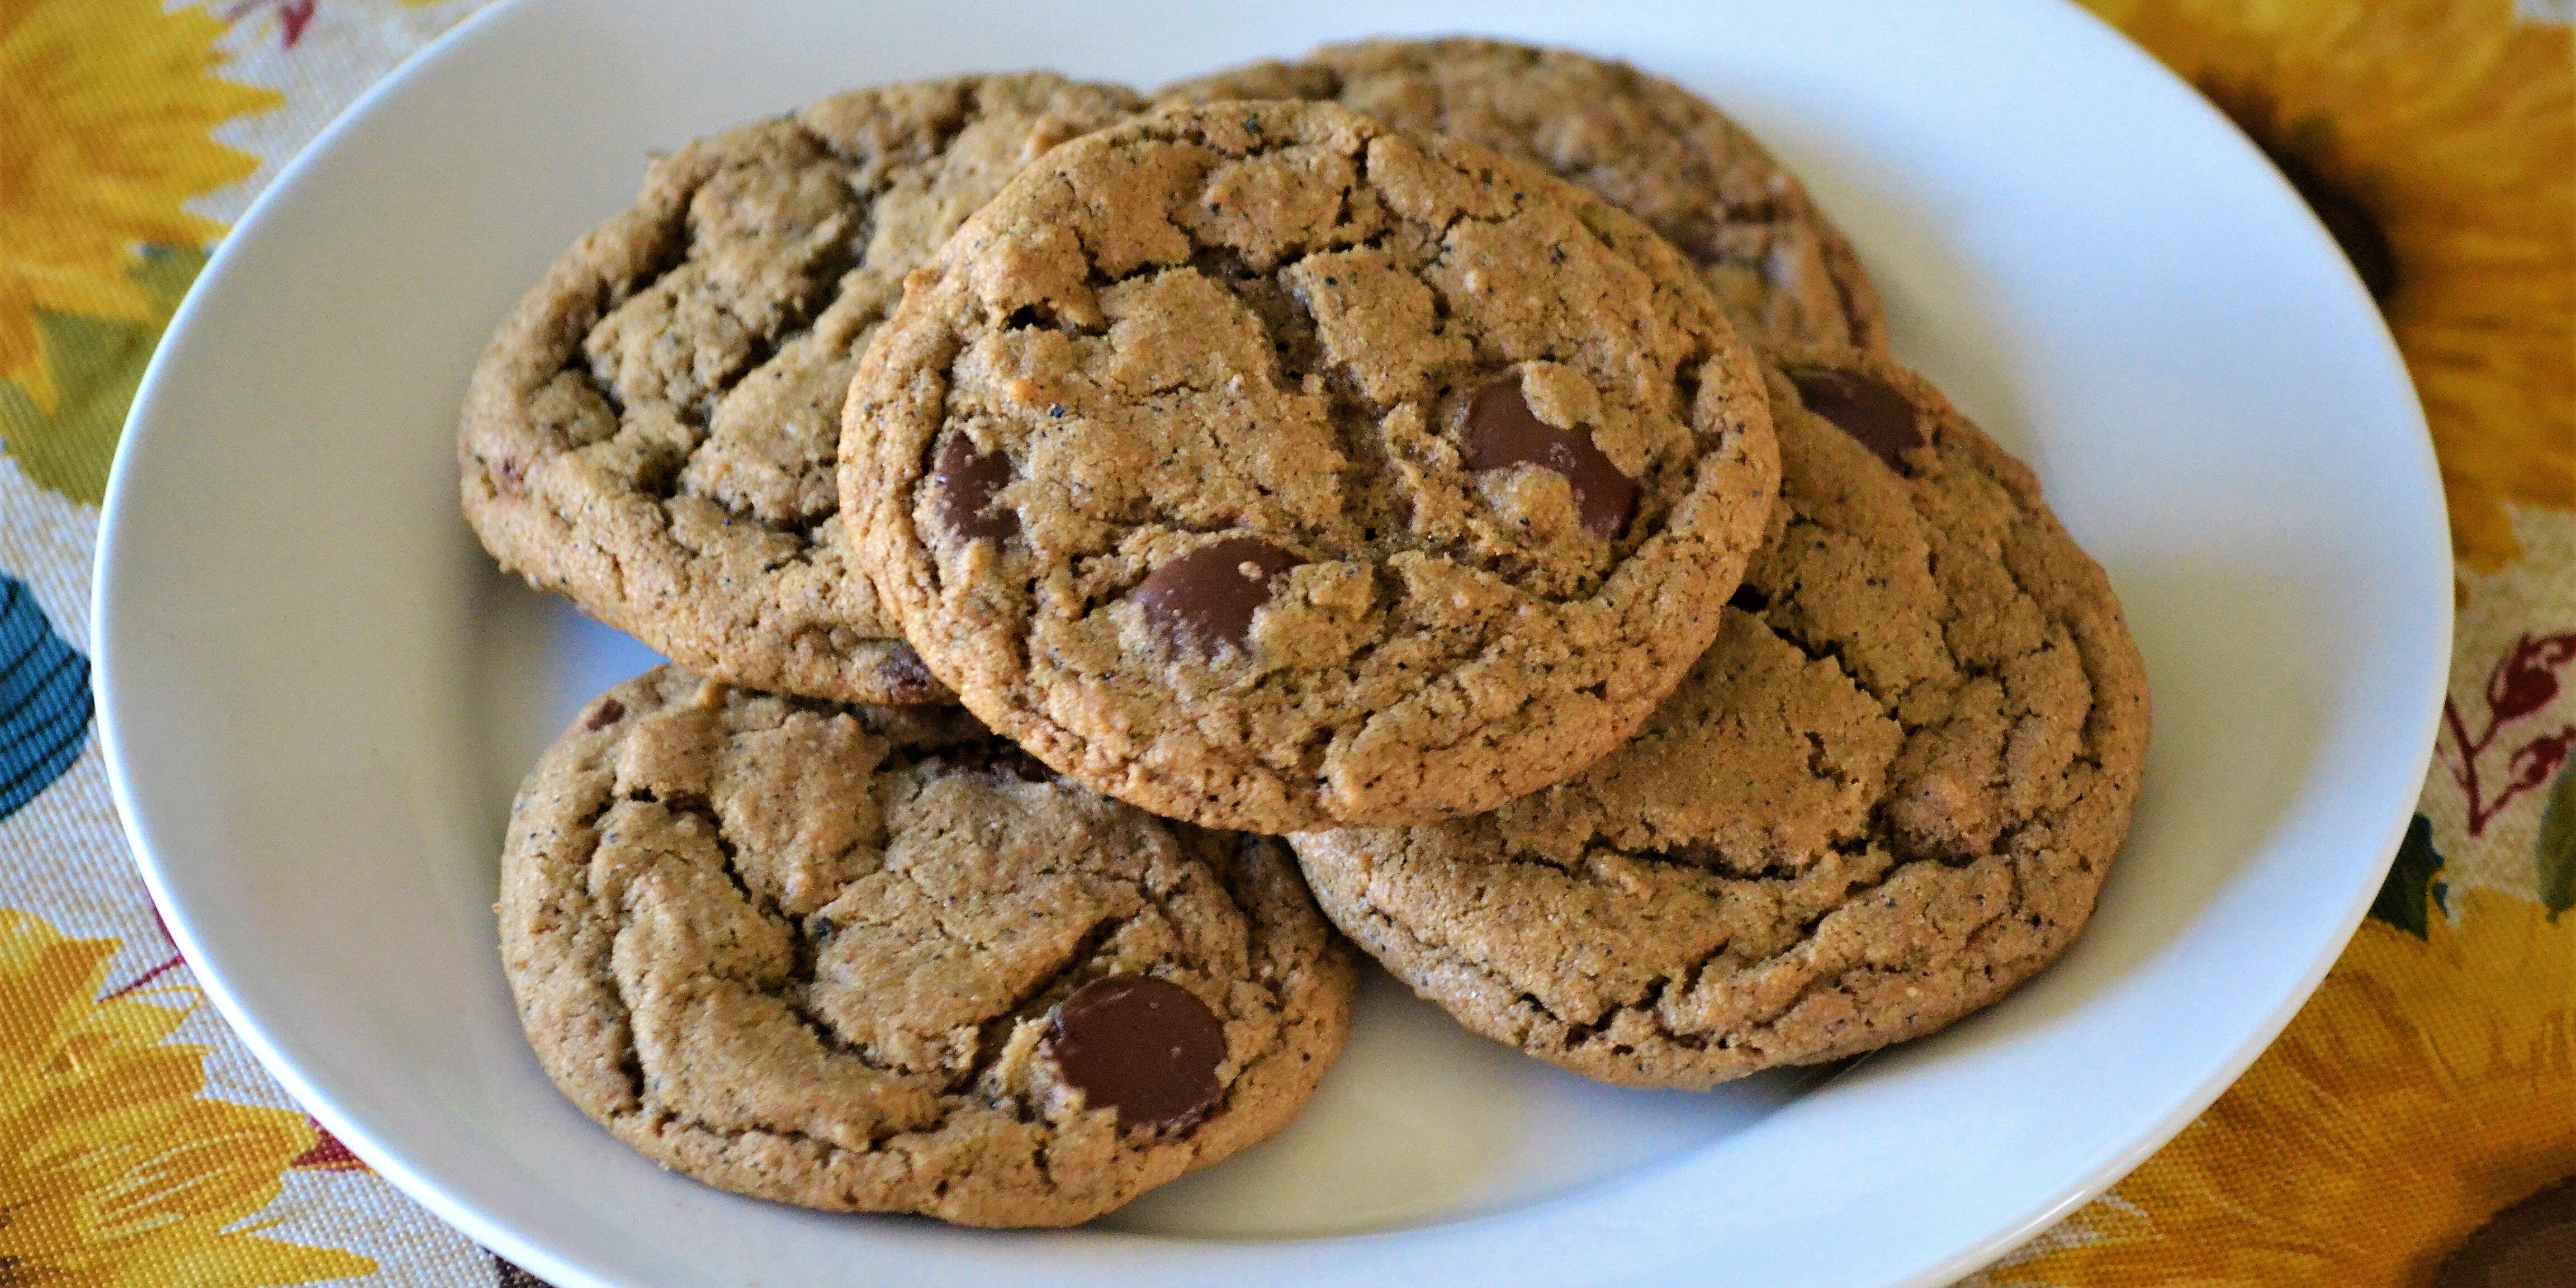 cardamom and espresso chocolate chip cookies recipe